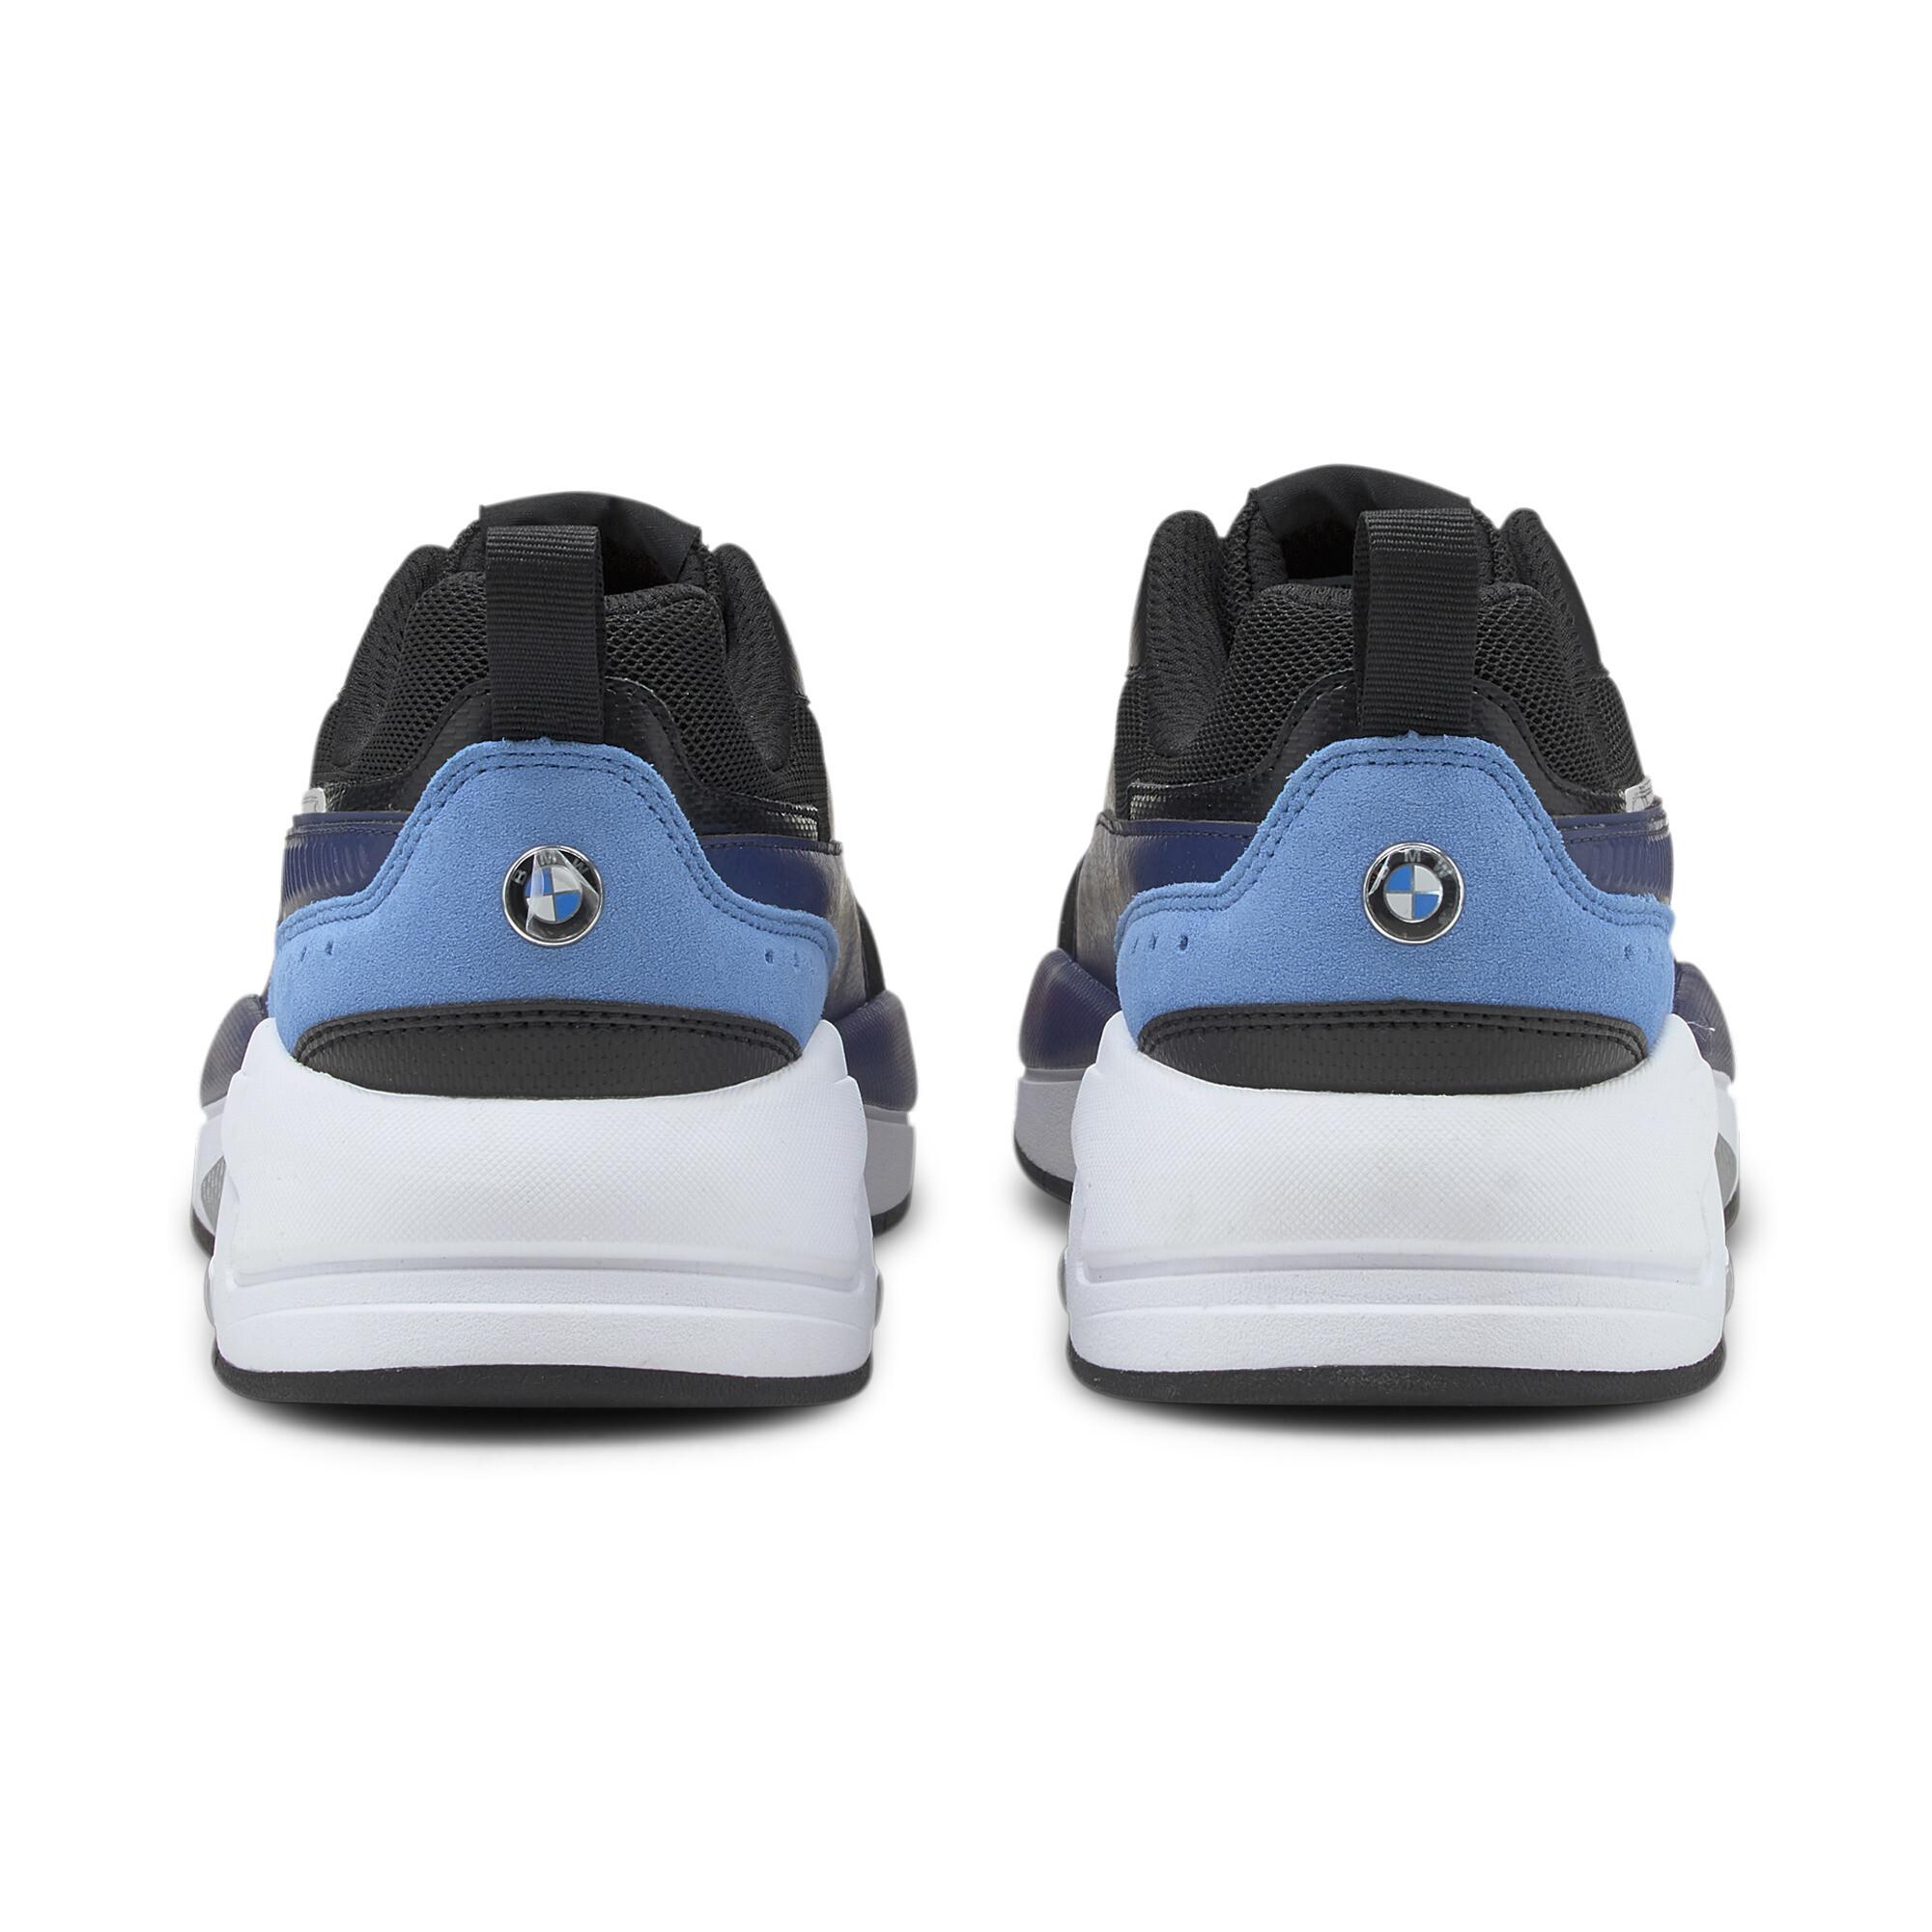 thumbnail 6 - PUMA Men's BMW M Motorsport X-RAY 2.0 Sneakers